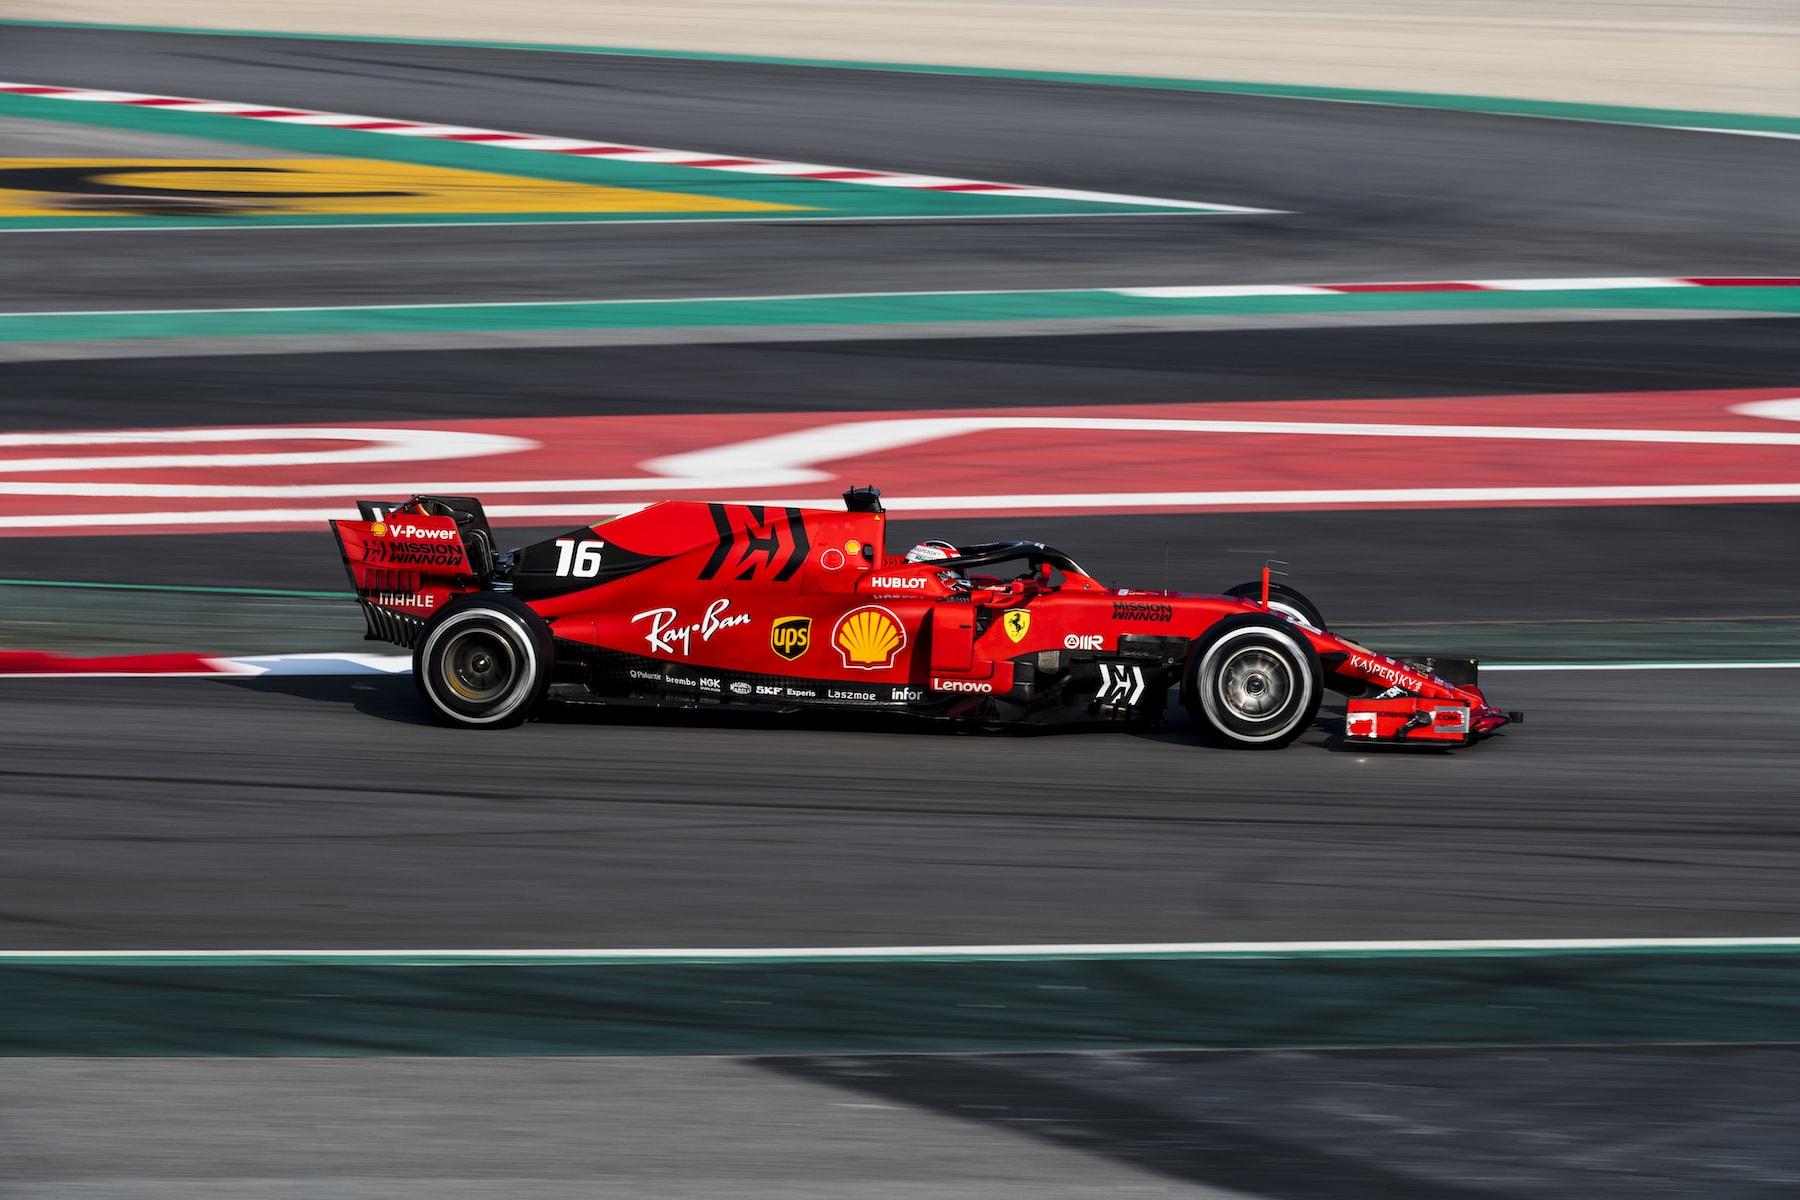 2019 Charles Leclerc | Ferrari SF90 | 2019 Barcelona T2 D1 1 copy.jpg